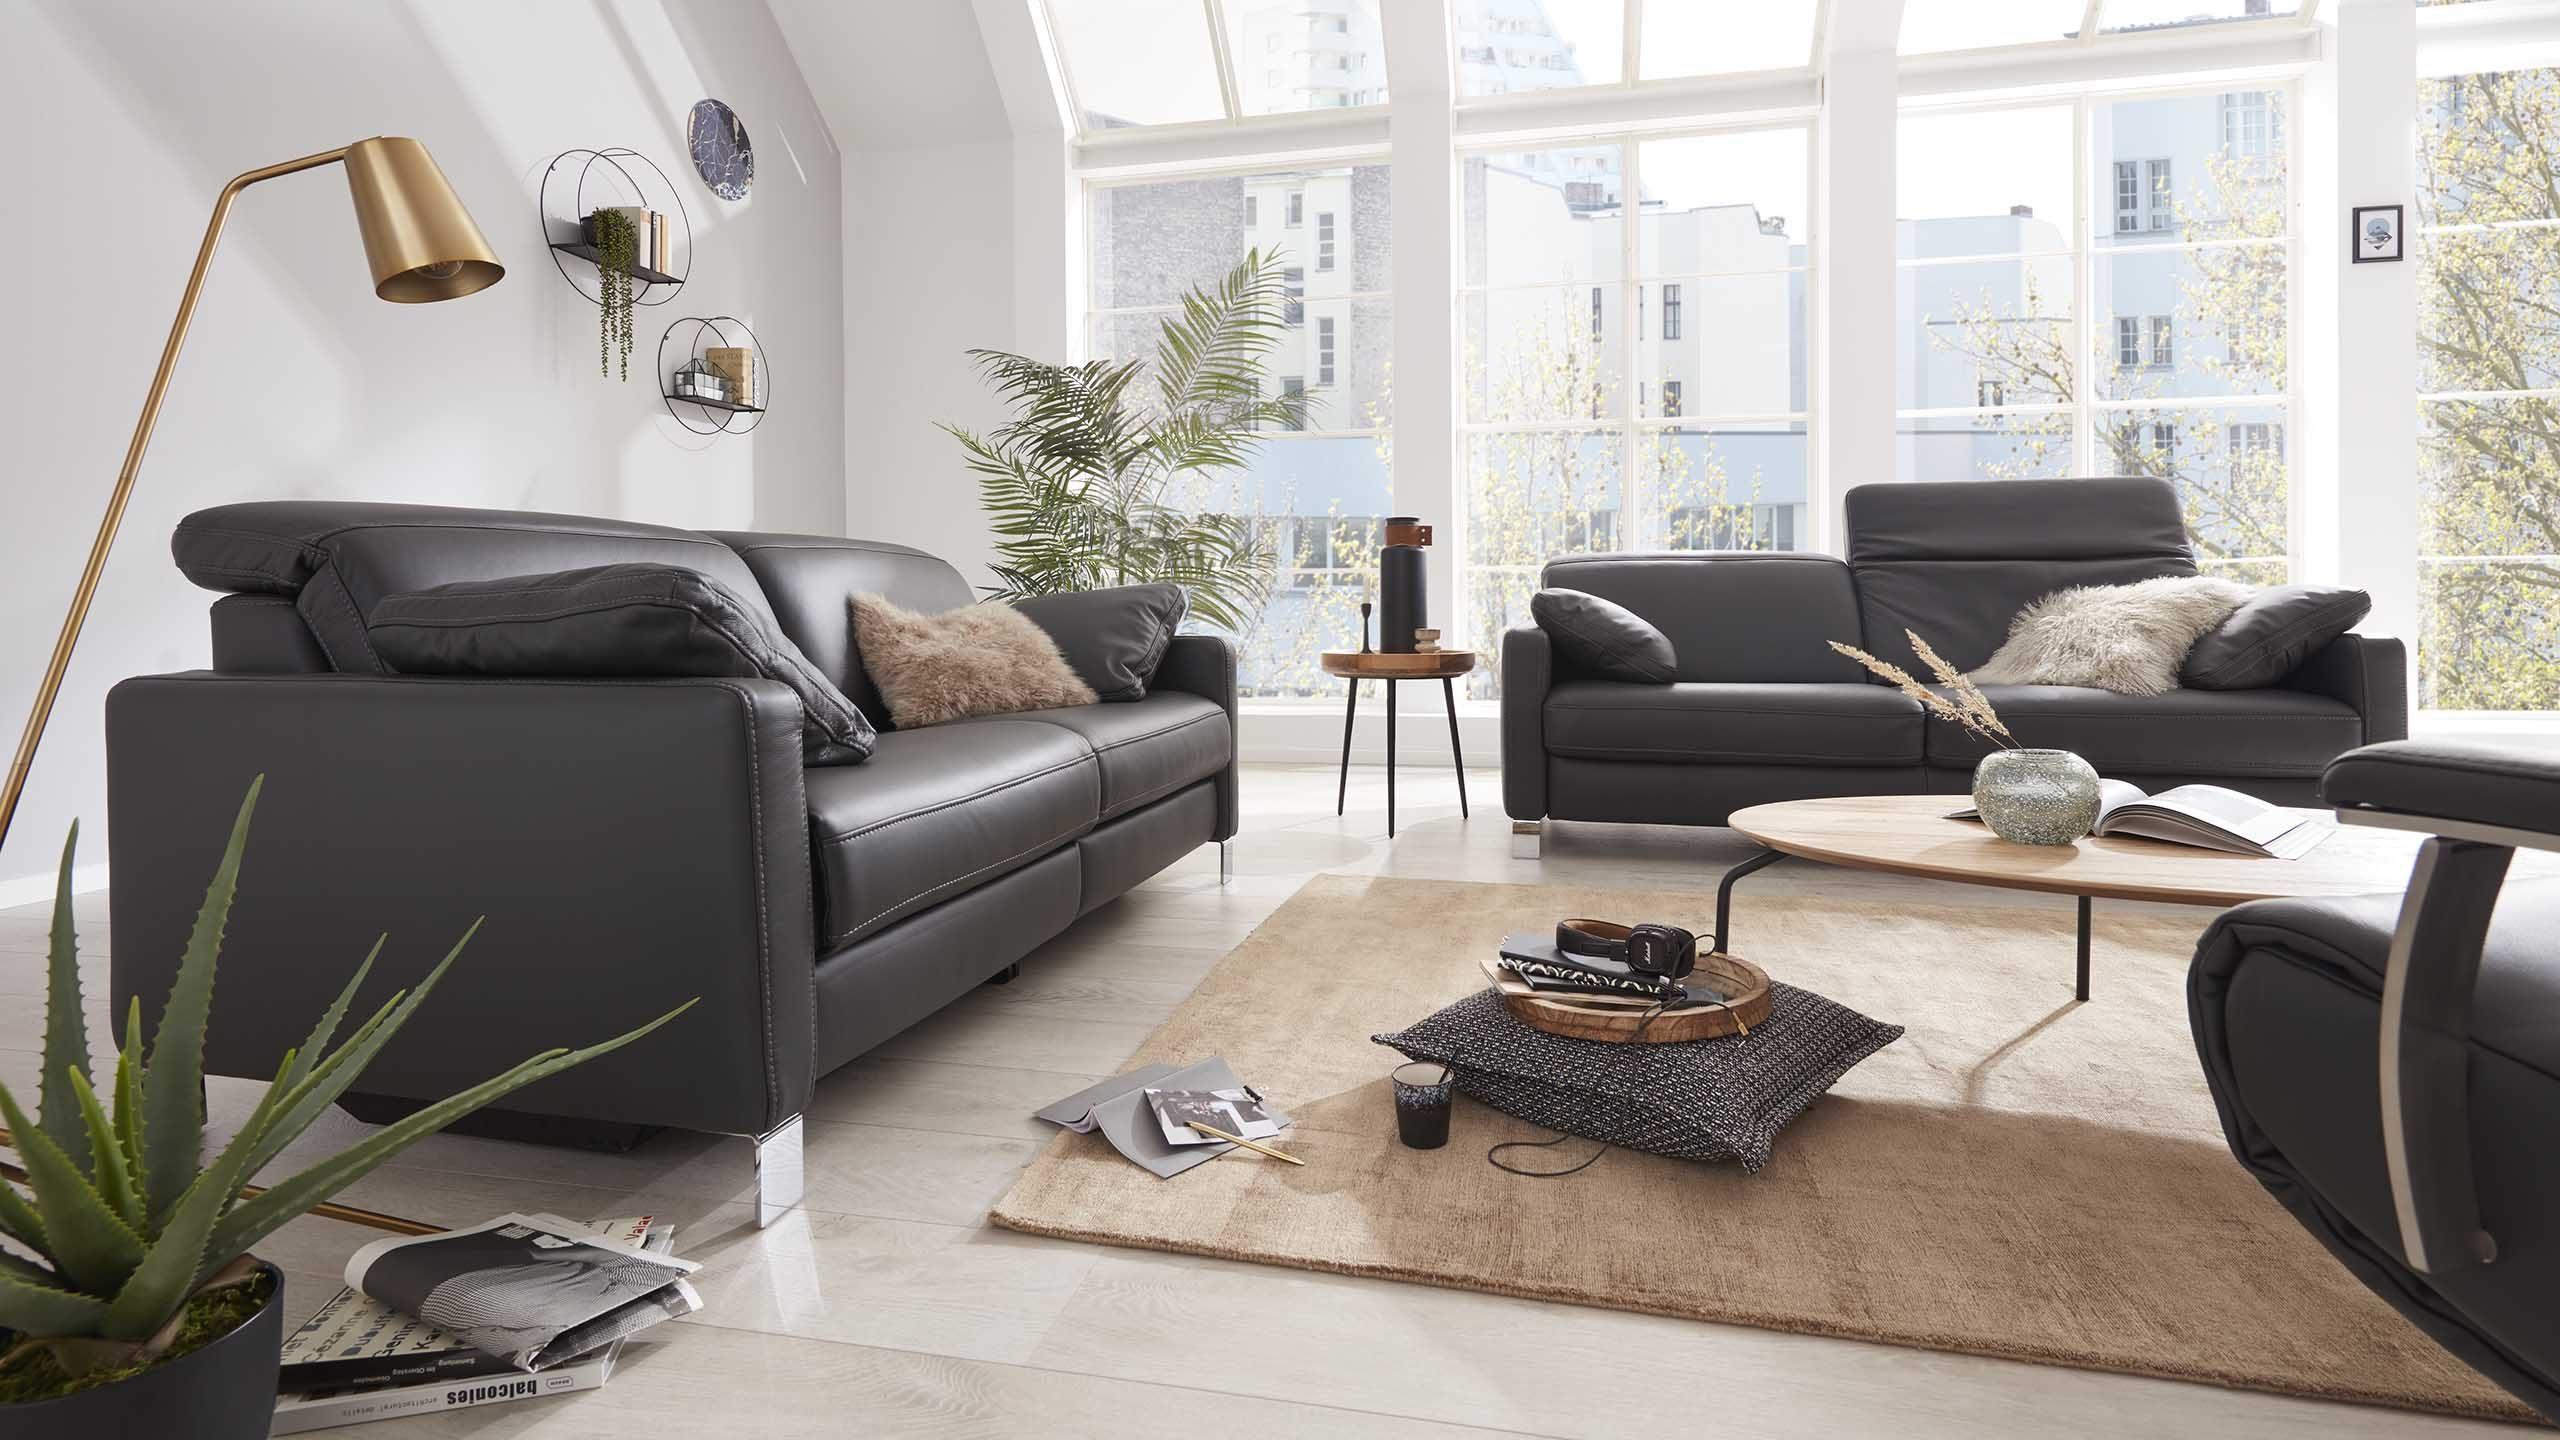 Interliving Sofa Serie 4054 in anthrazit